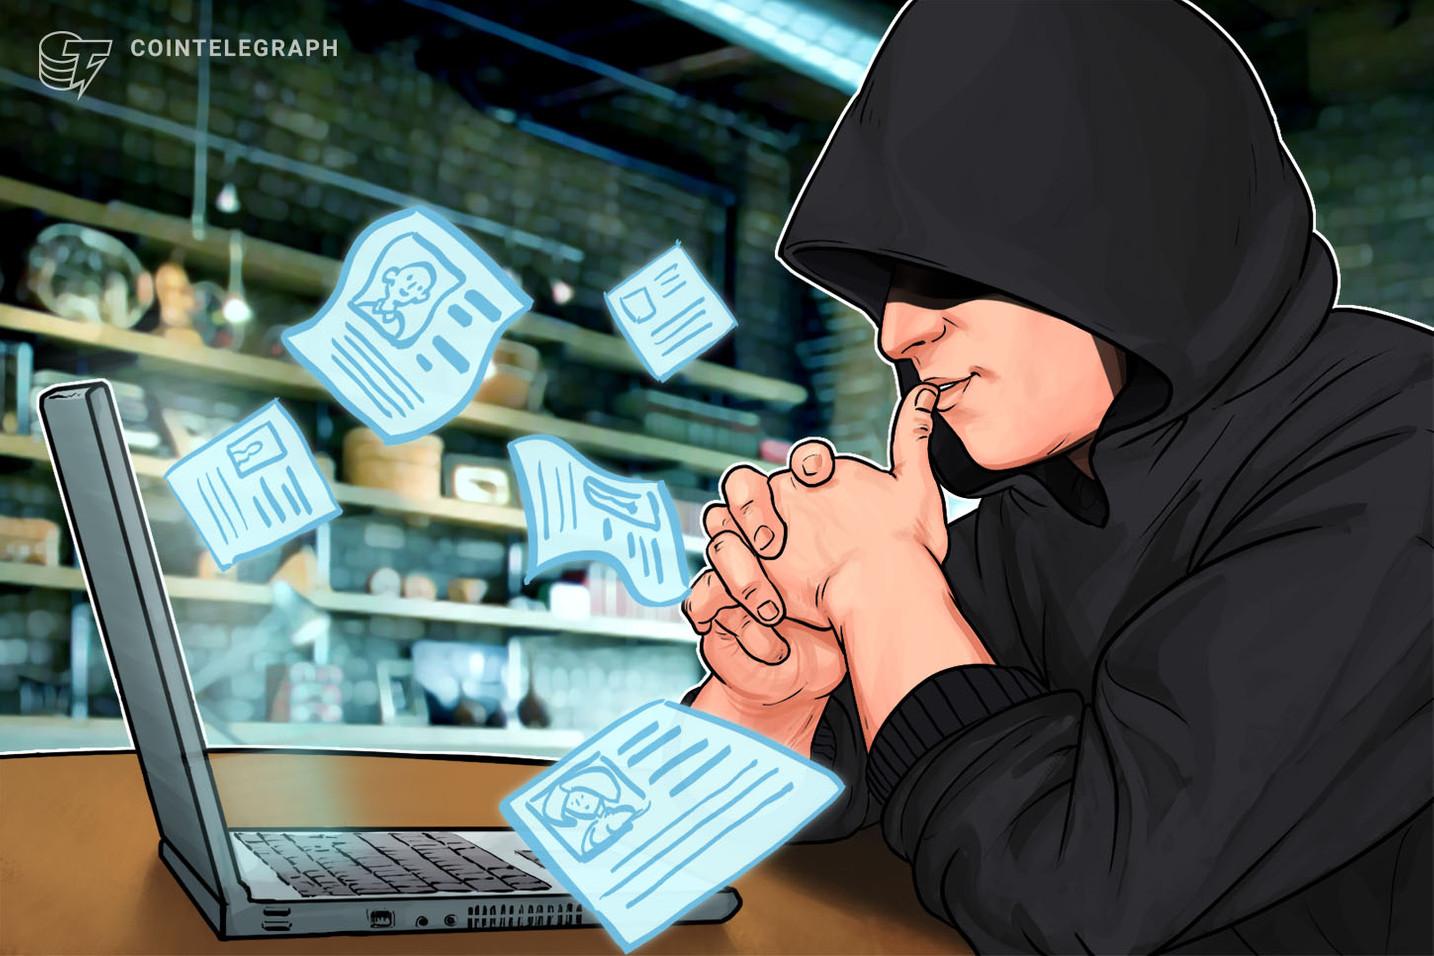 İDDİA: Eski Wirecard COO'su Rus İstihbaratıyla Bağlantılı Olabilir!